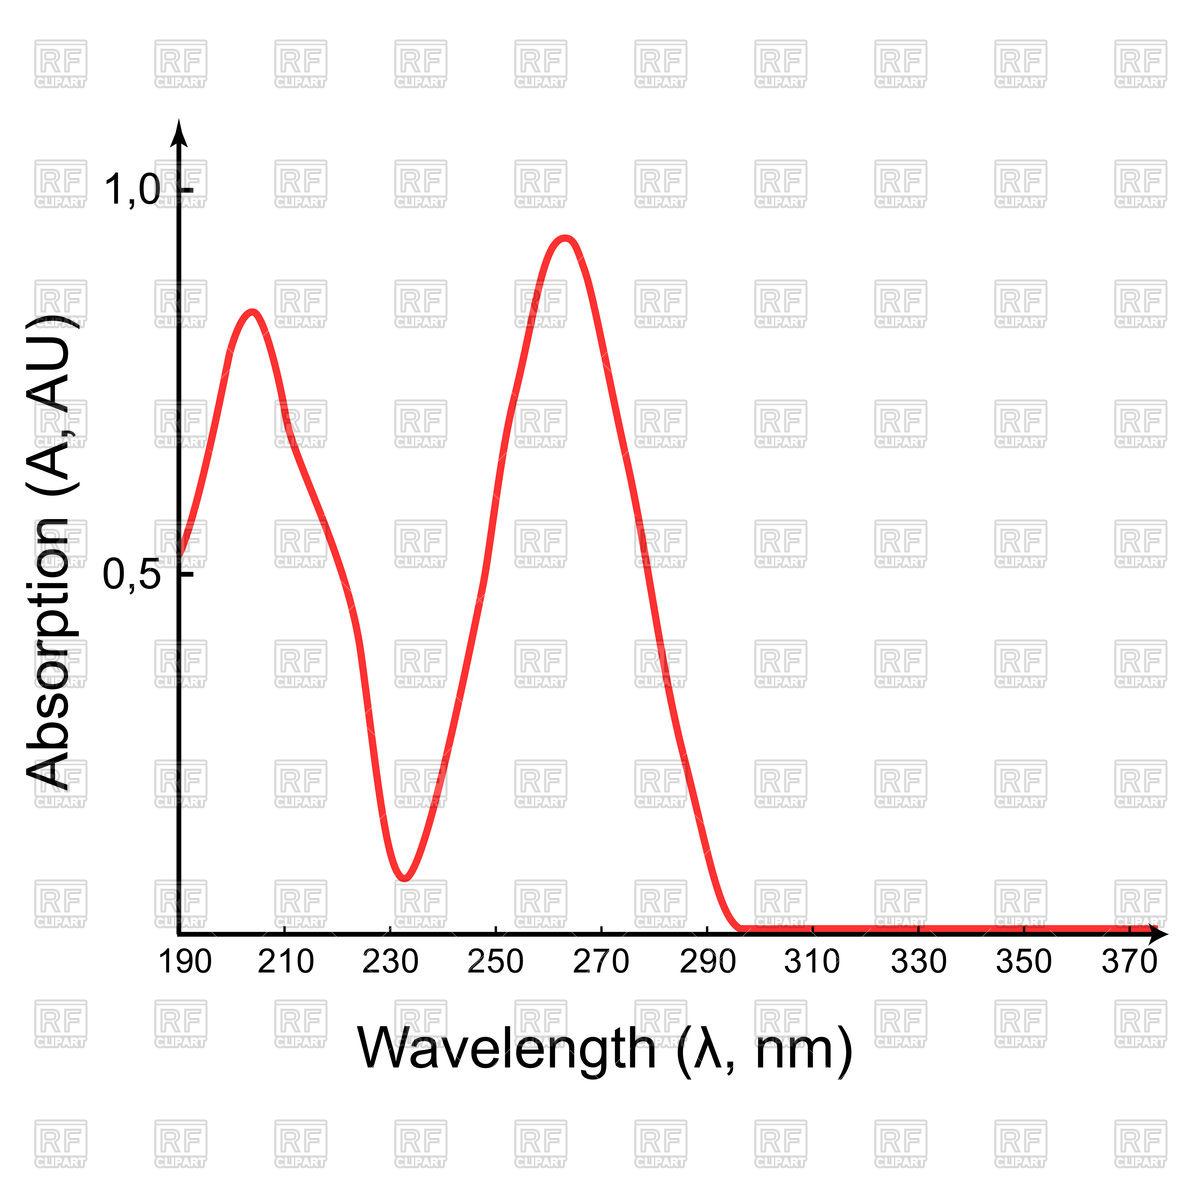 1200x1200 Scientific Absorption Spectrum In The Uv Wavelength Range, Graph